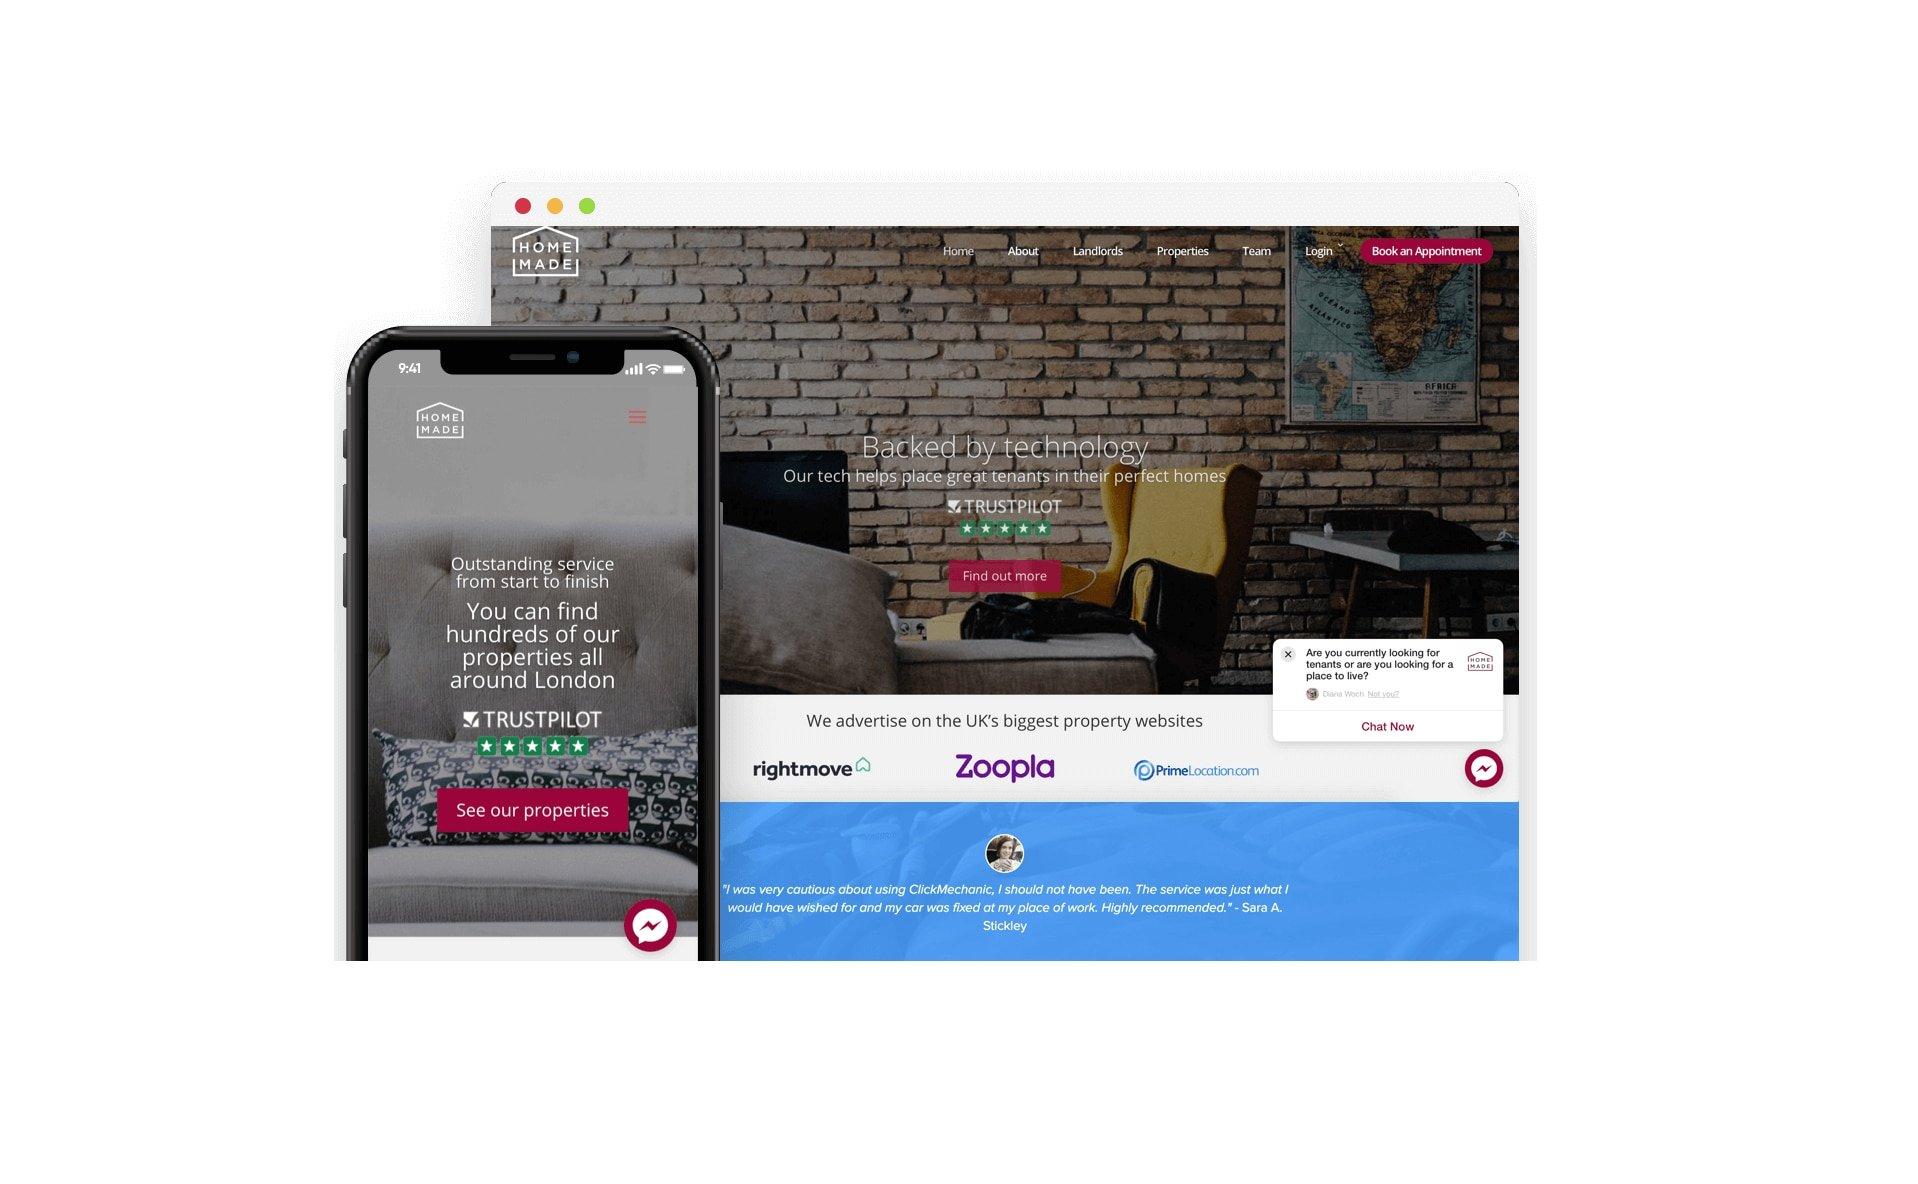 homemade app interface